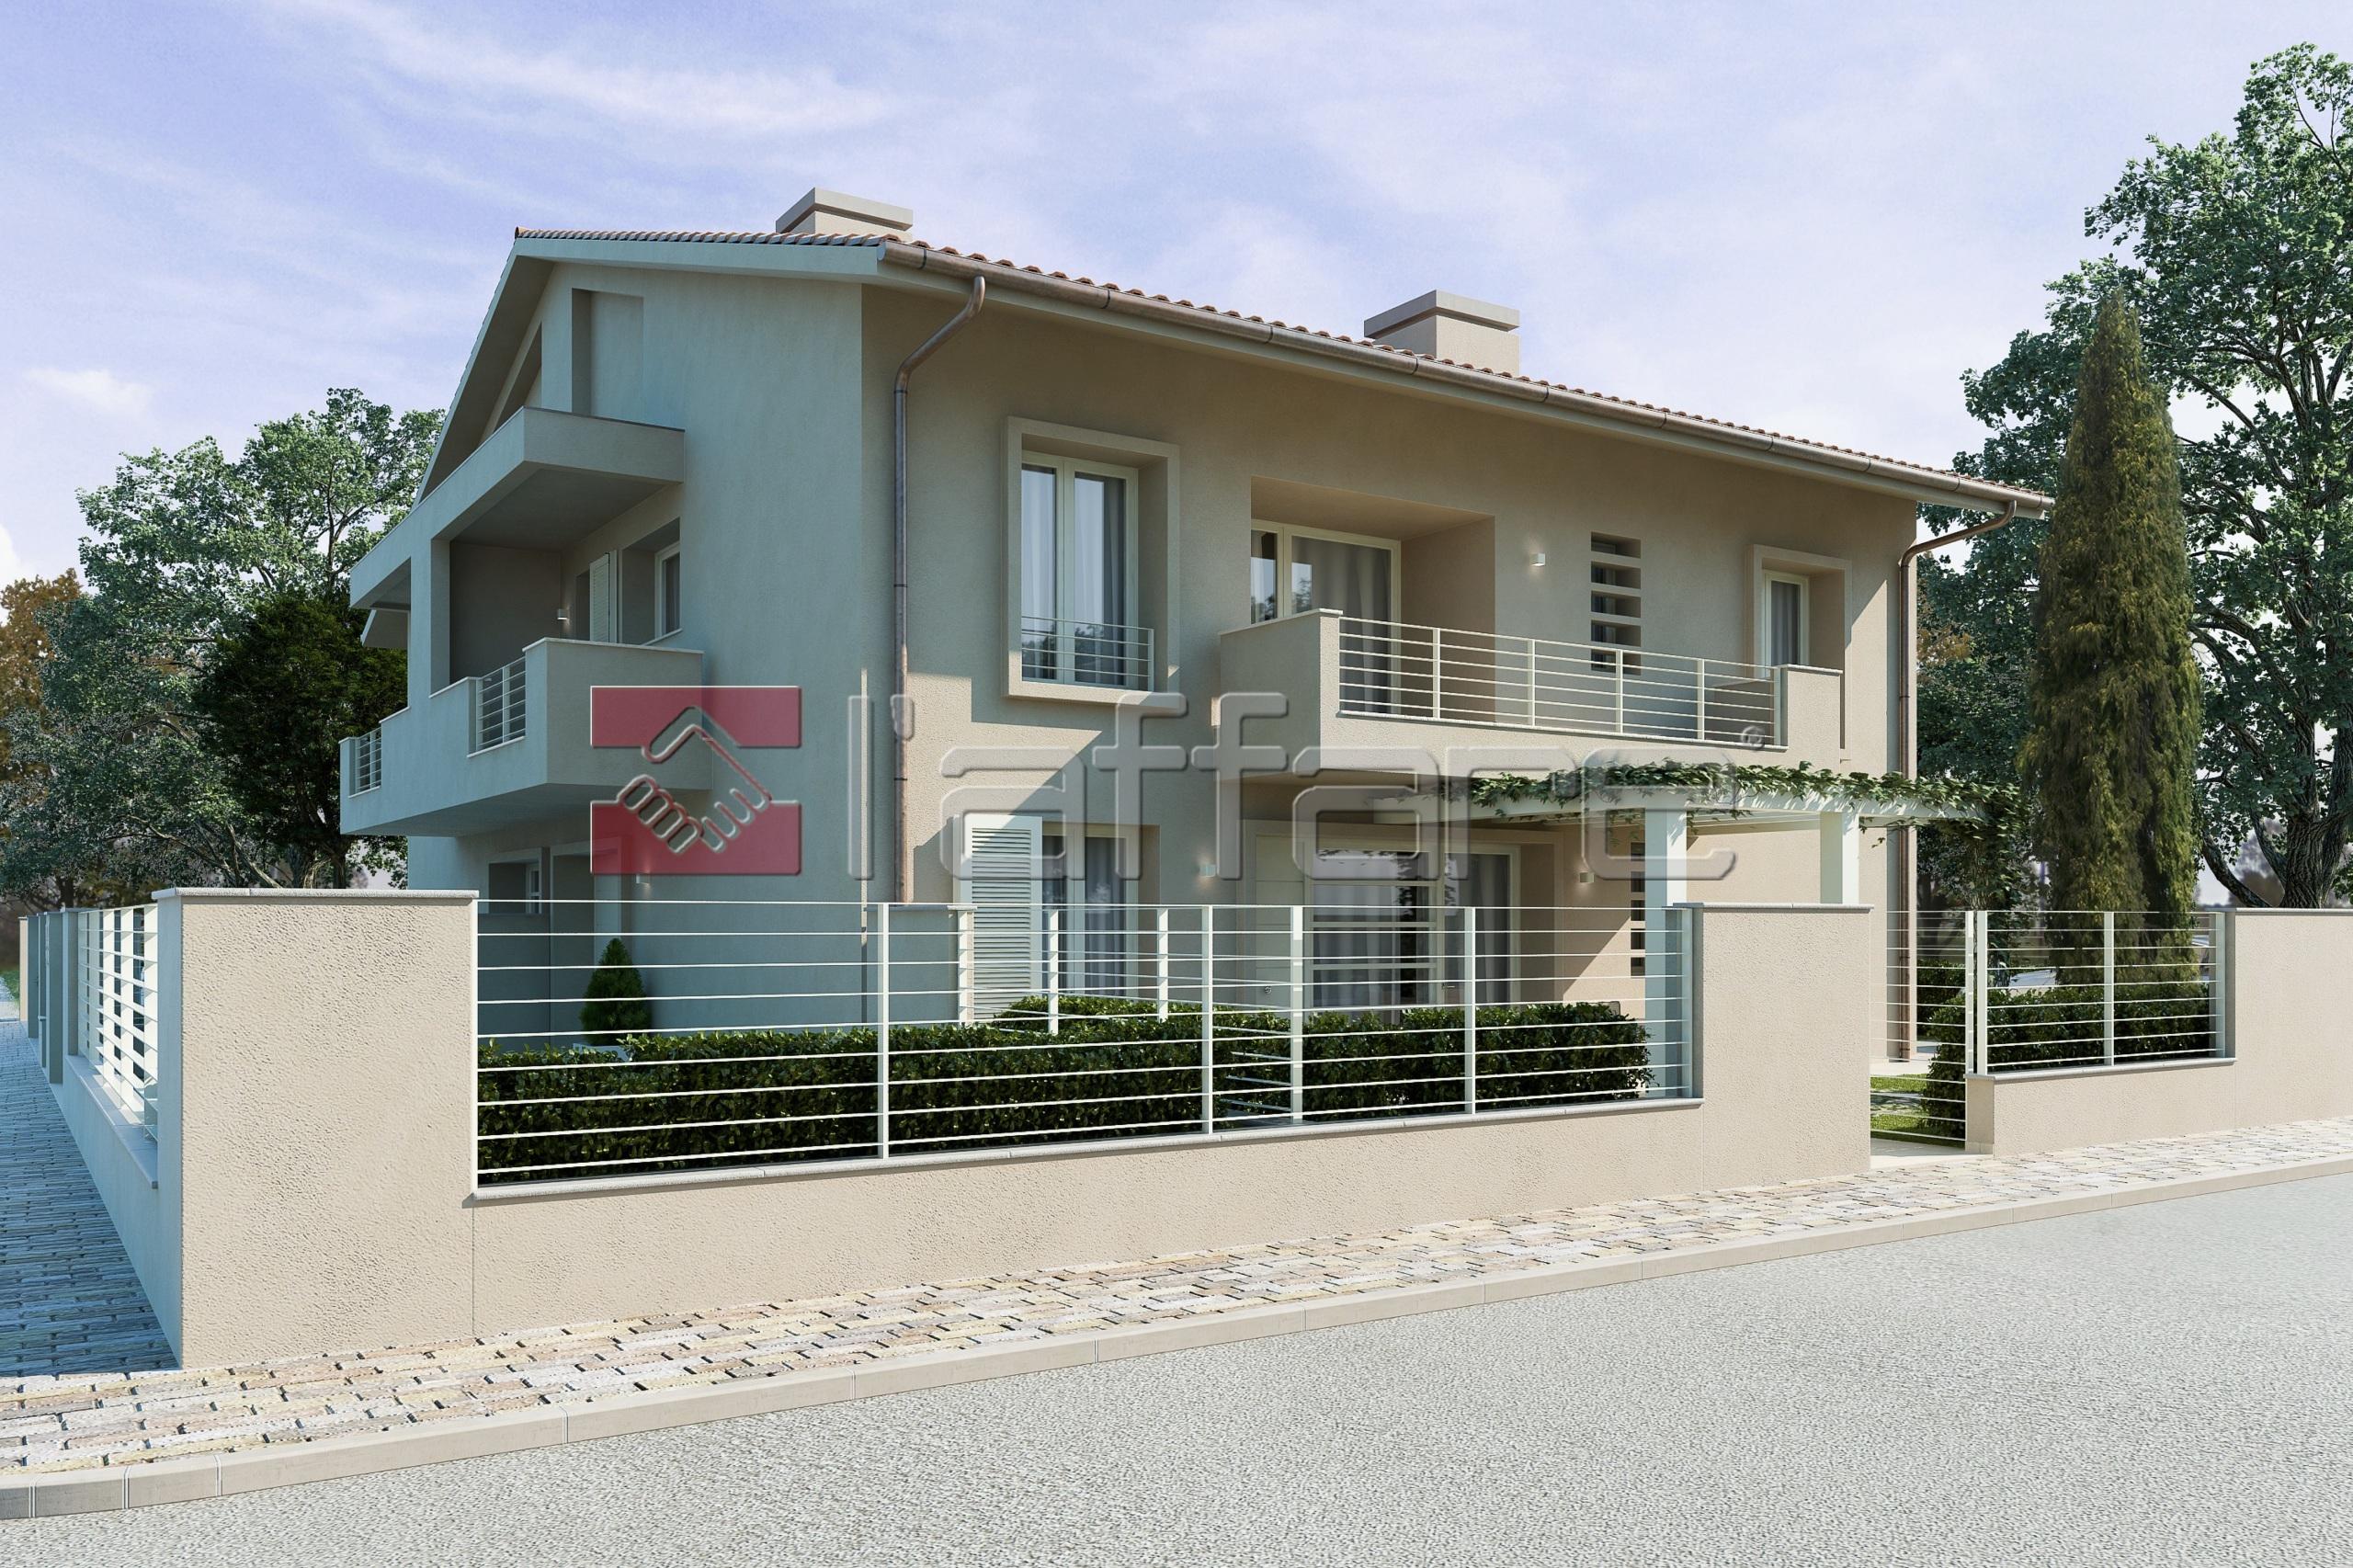 case in vendita pontedera appartamento quadrilocale in vendita pontedera bellaria l